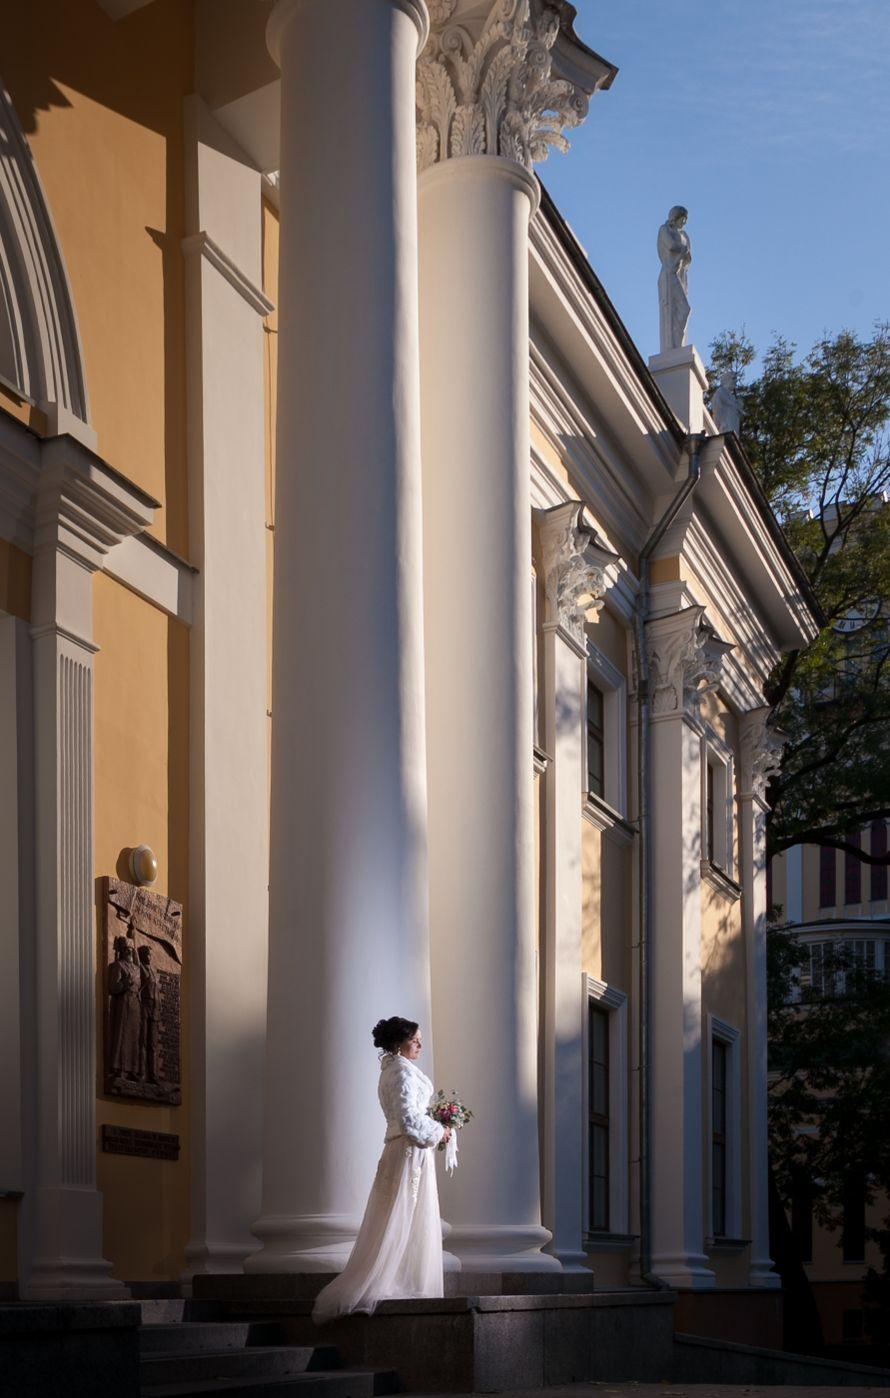 Фото 18979916 в коллекции Портфолио - Фотограф Александр Пушков